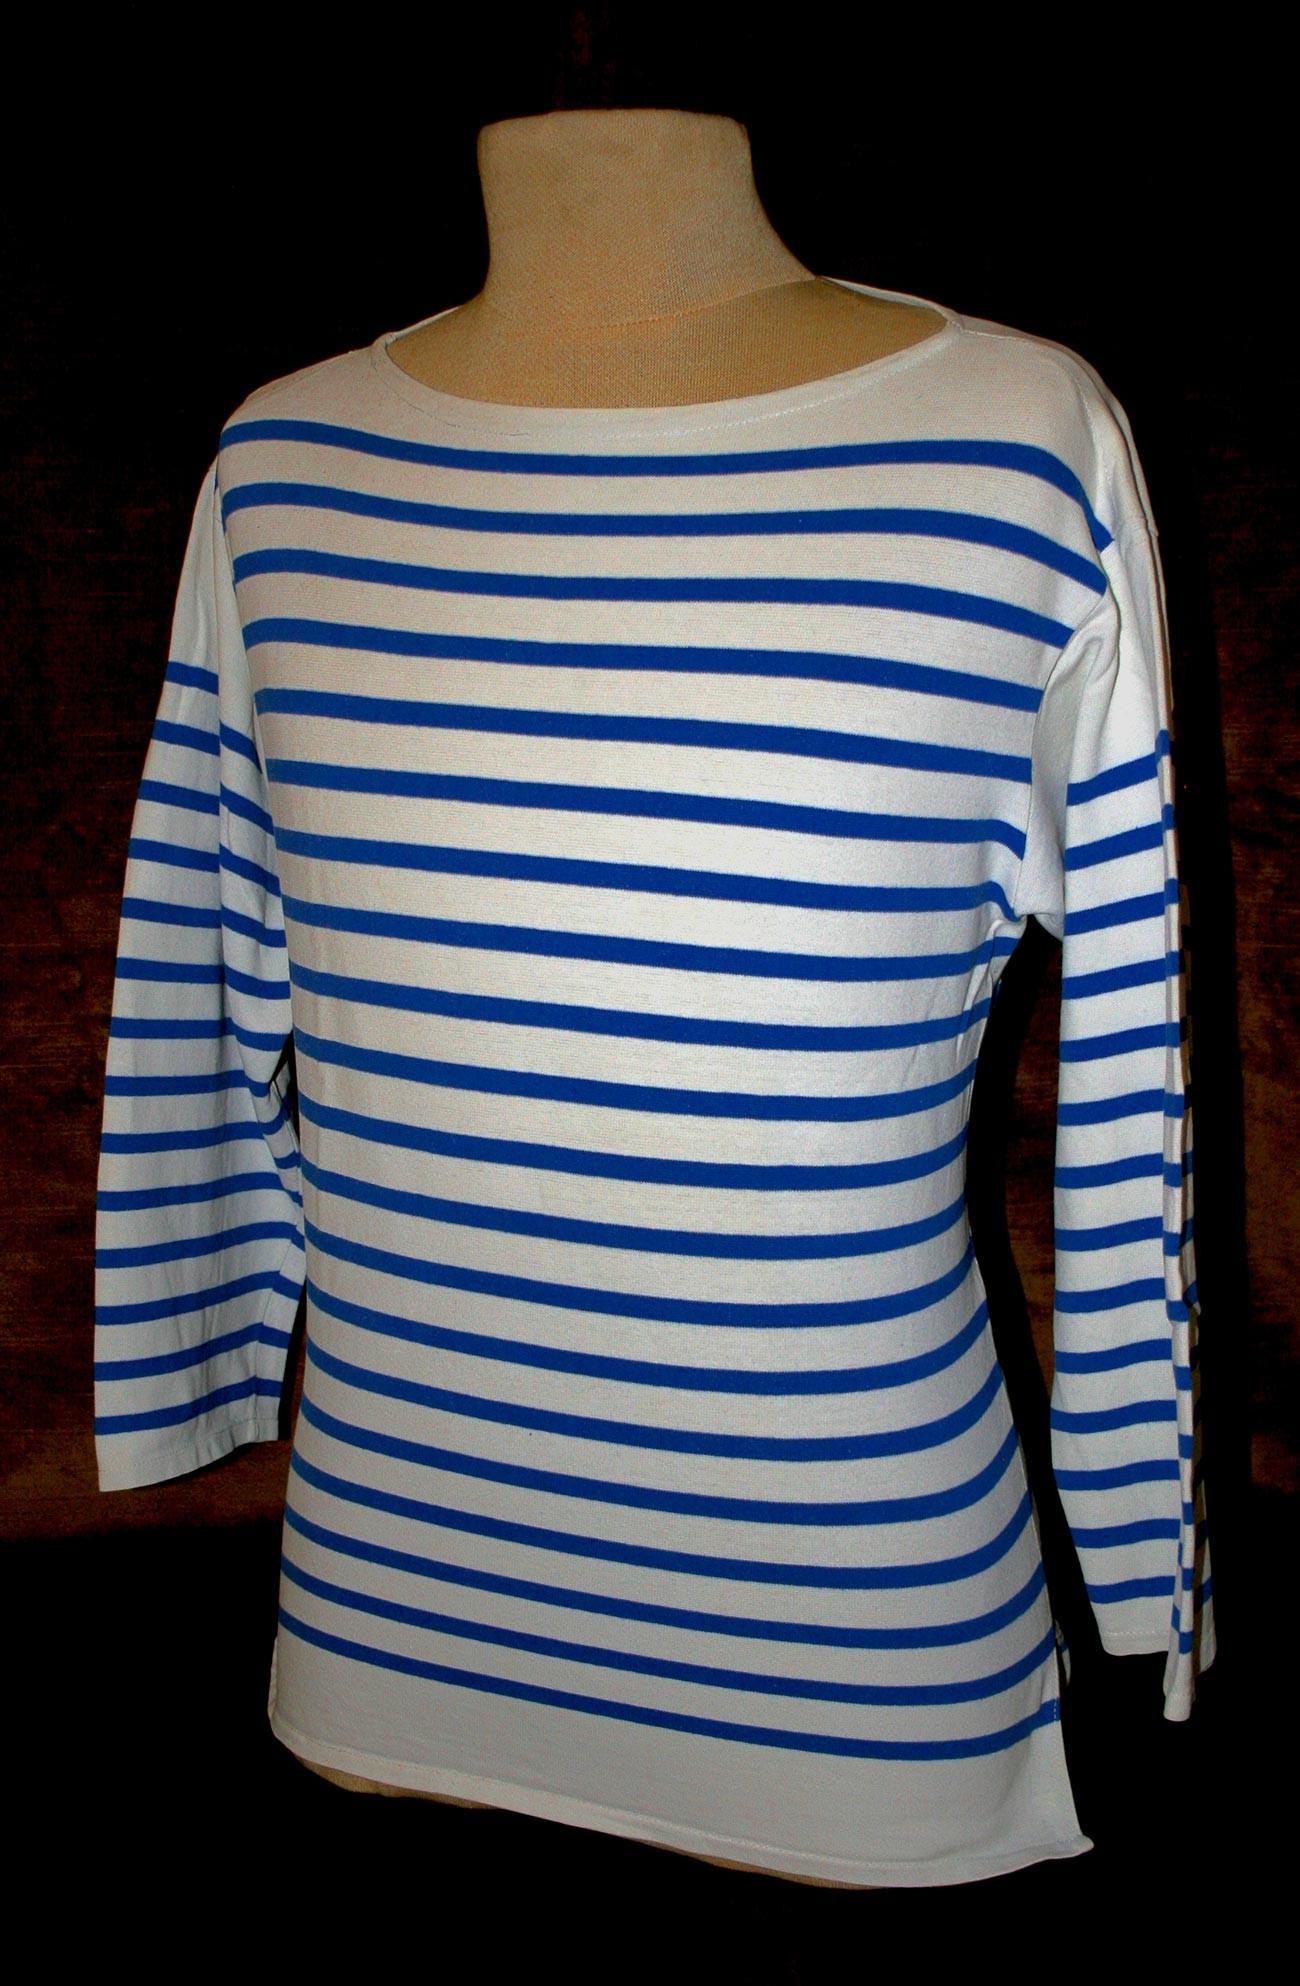 La maglia bretone dei marinai francesi